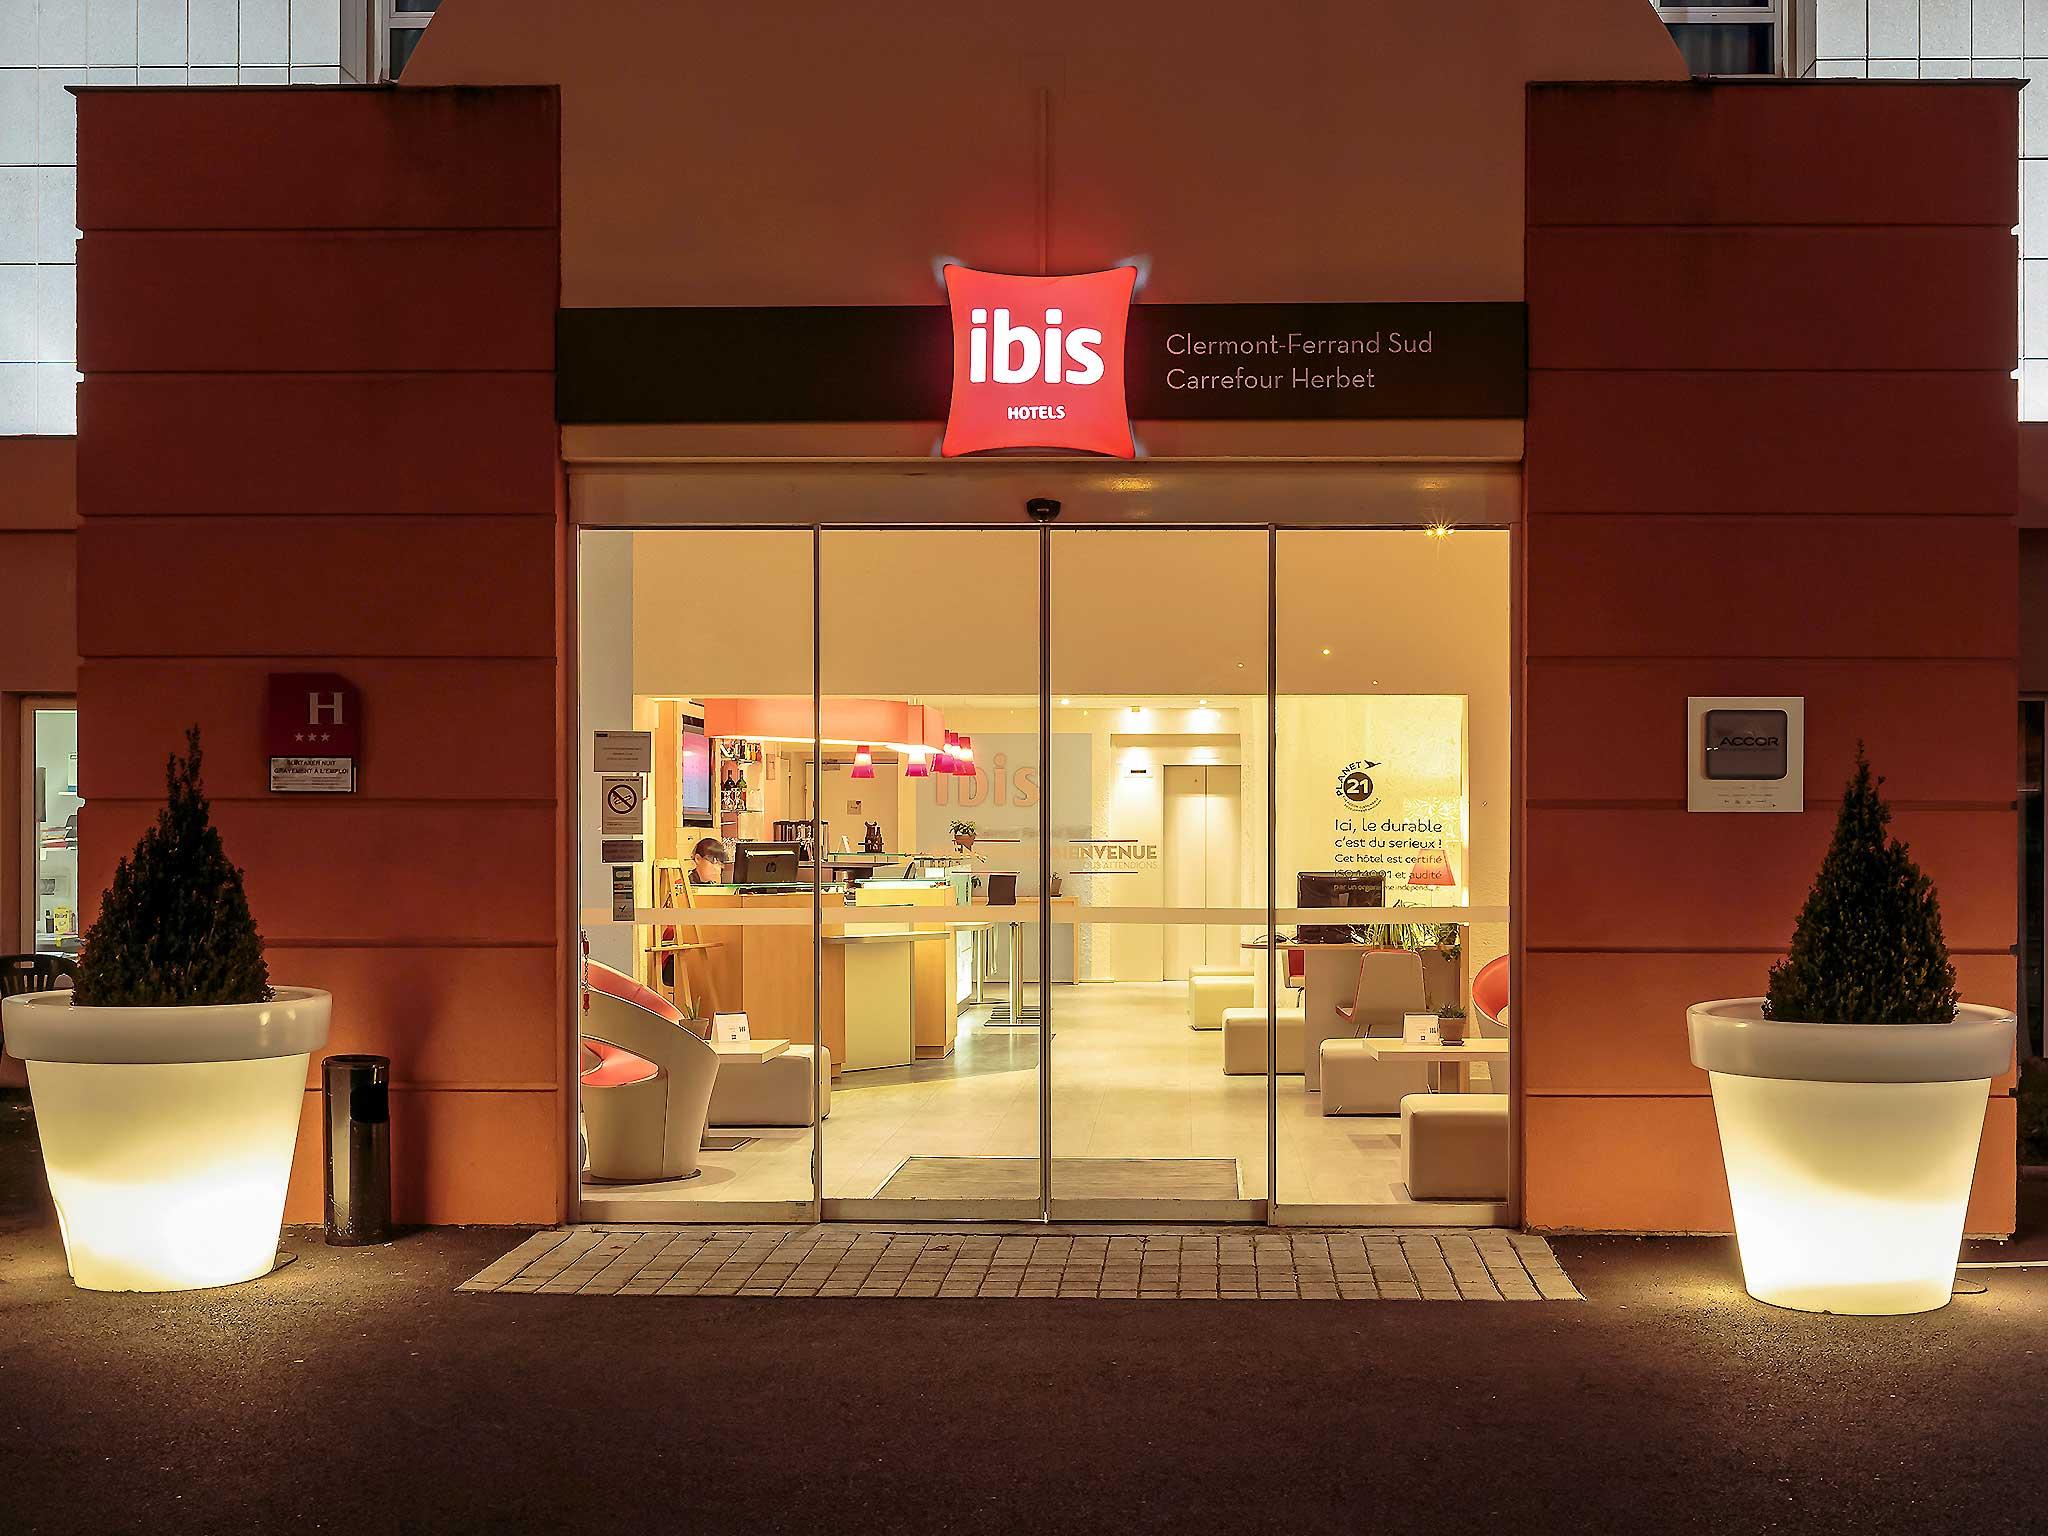 Hotel – ibis Clermont Ferrand Sud Carrefour Herbet